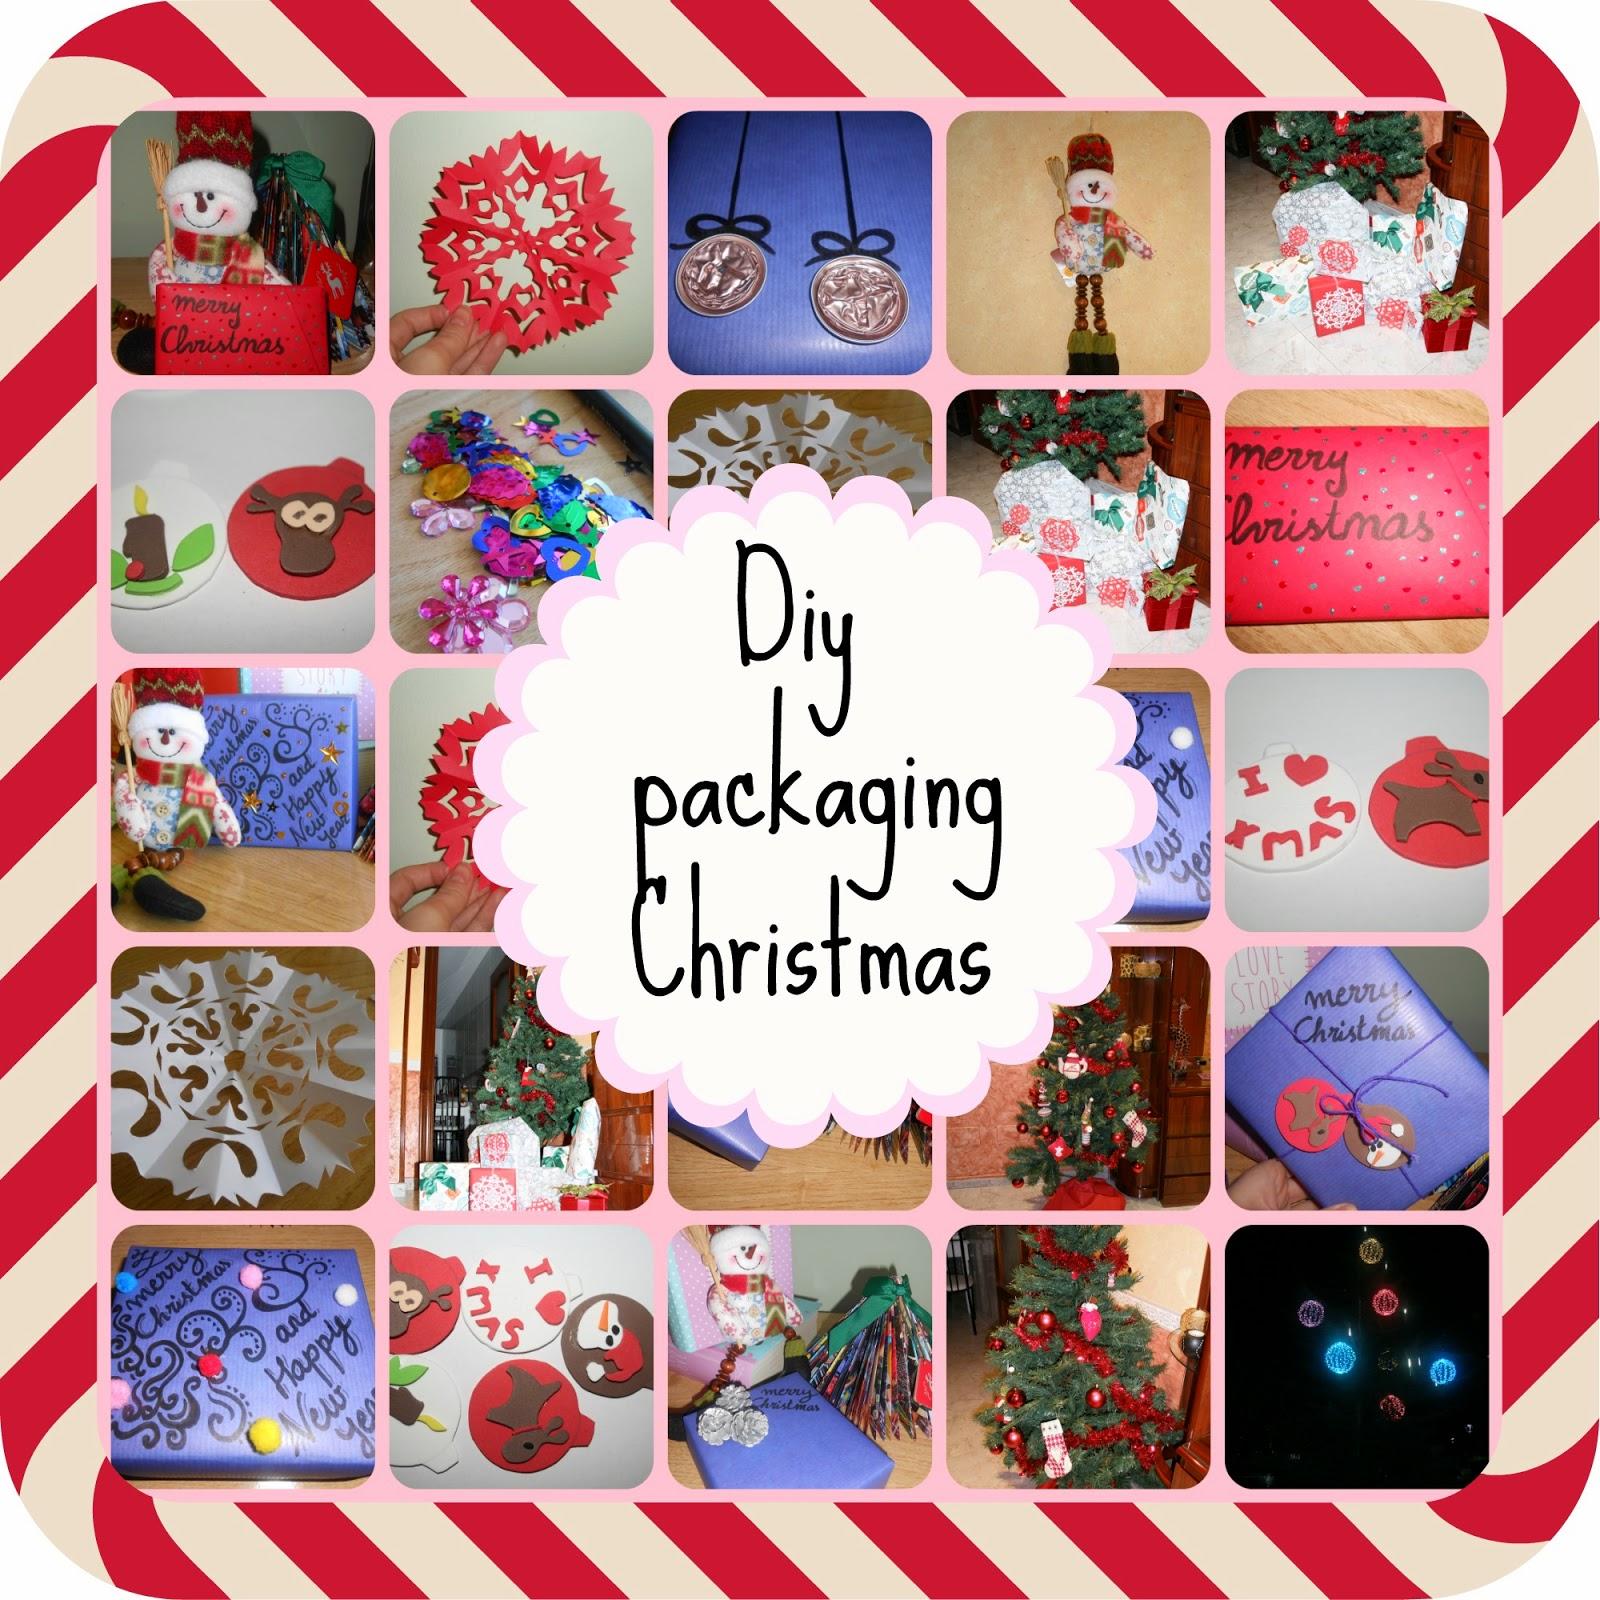 Diy 6 formas de empaquetado navide o - Empaquetado de regalos ...